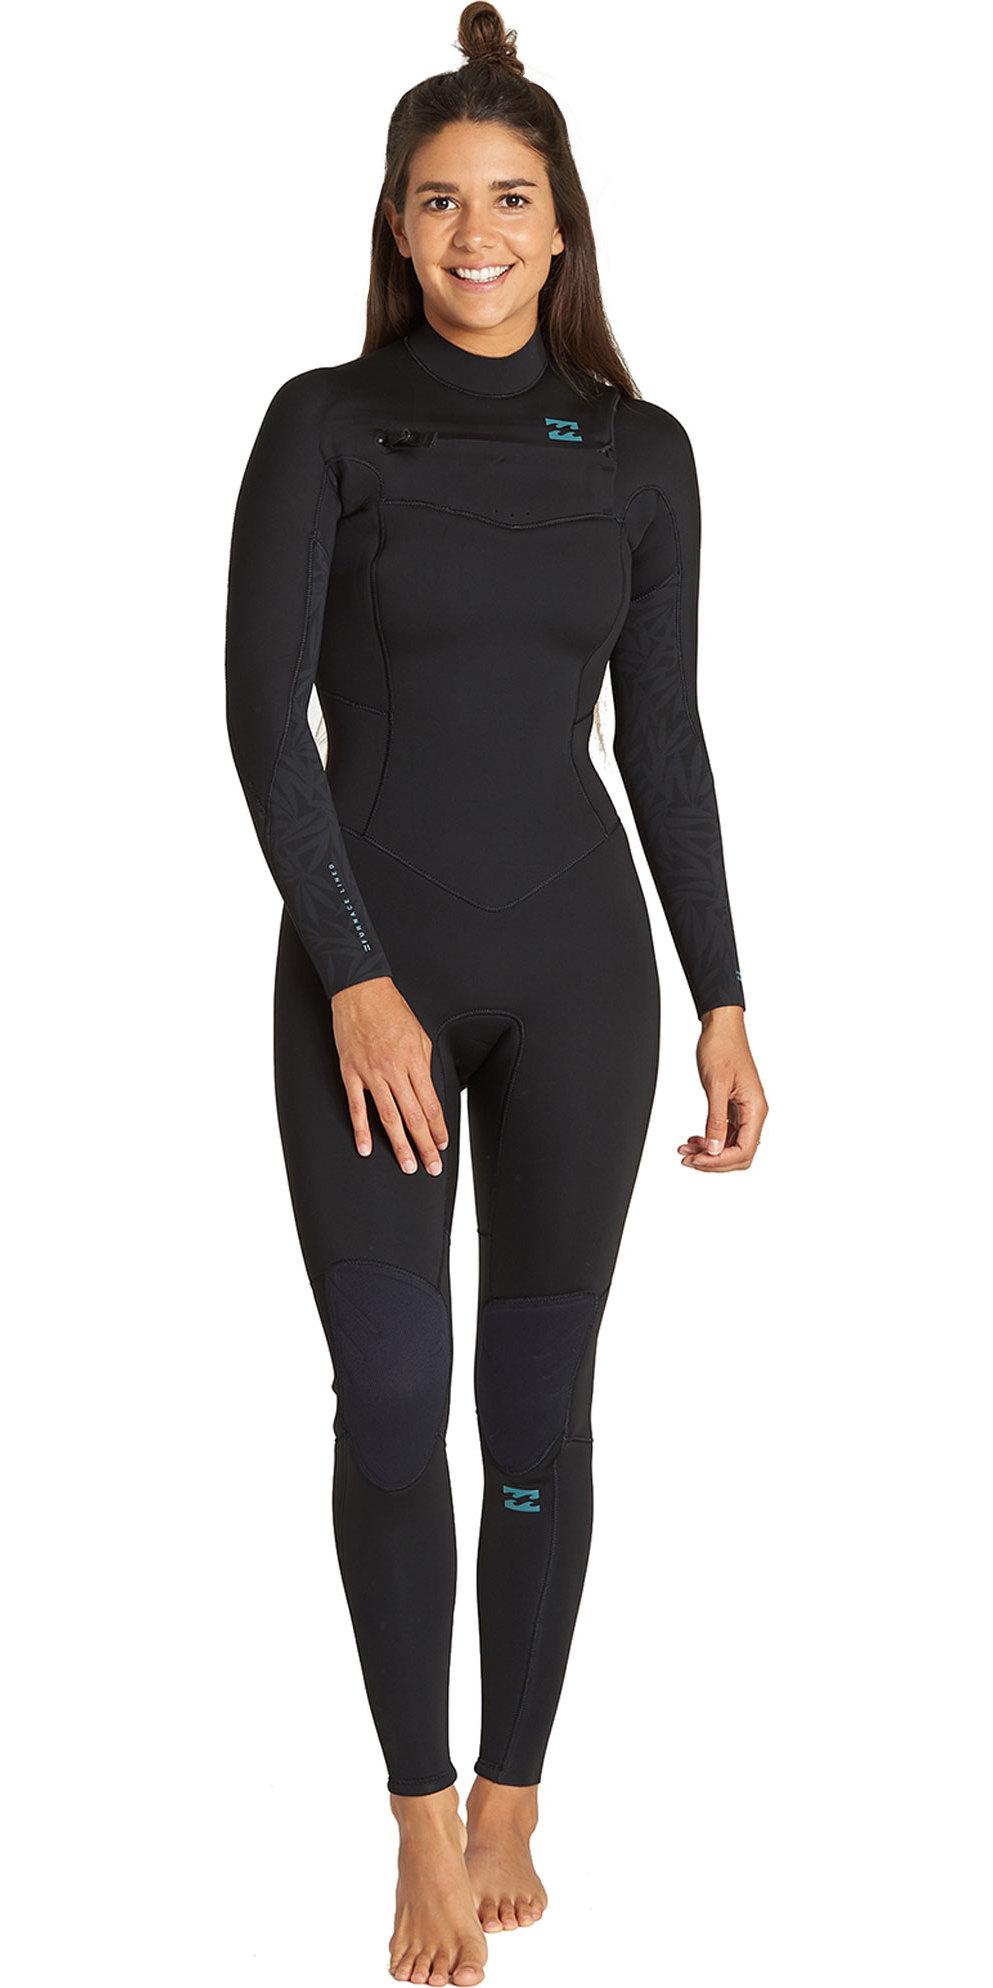 2019 Billabong Mujer Furnace Synergy 4/3mm Traje De Neopreno Con Chest Zip Negro Q44g32